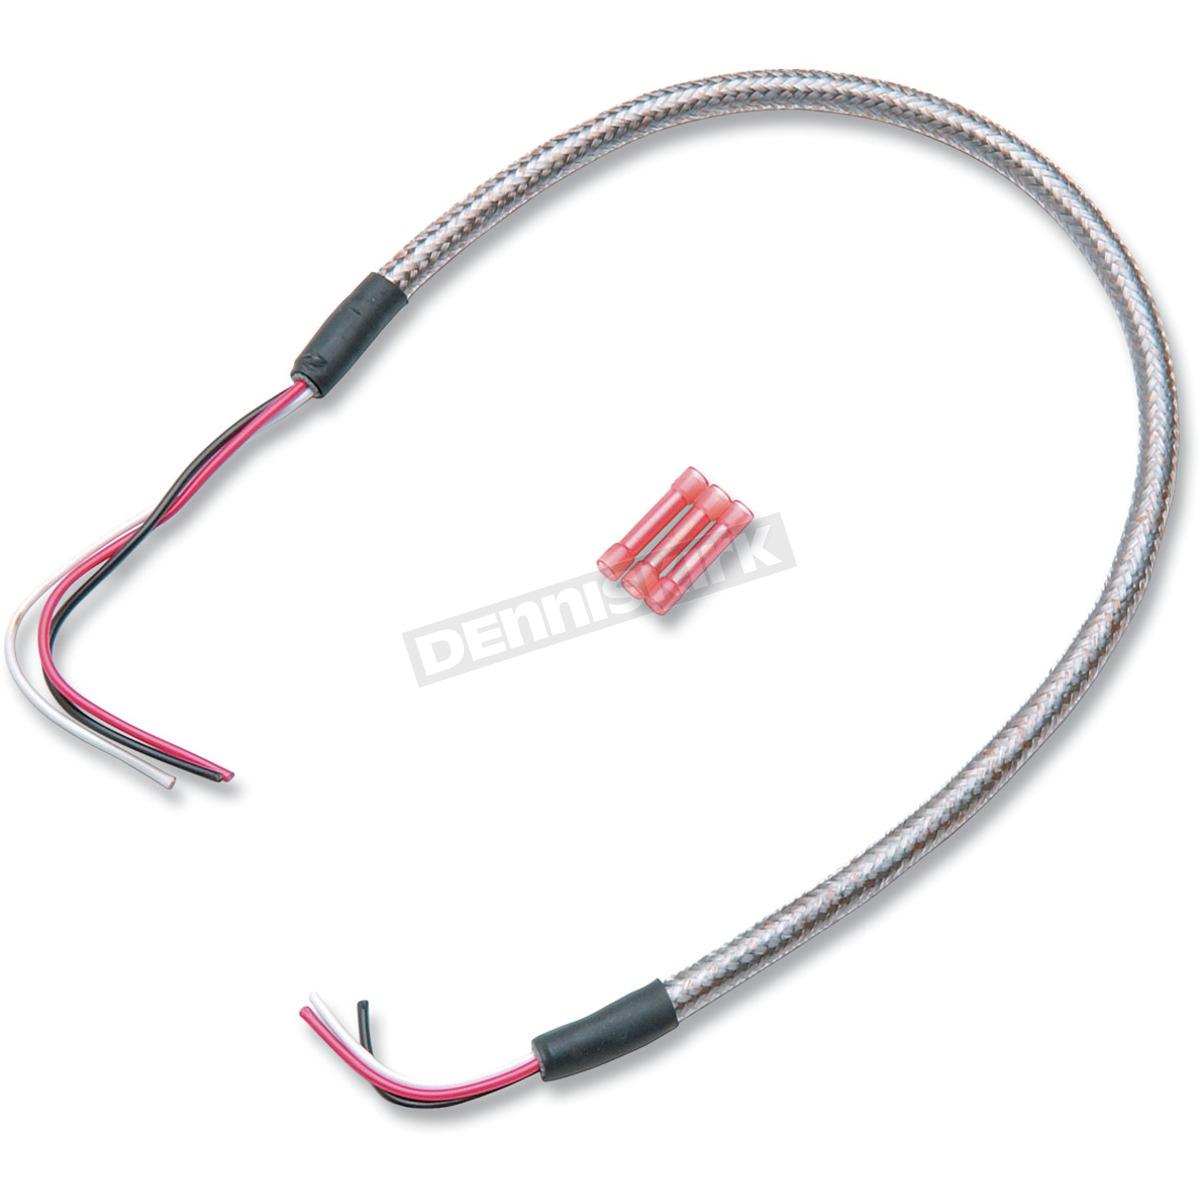 Namz Custom Cycle Products 18 In Headlight Braided